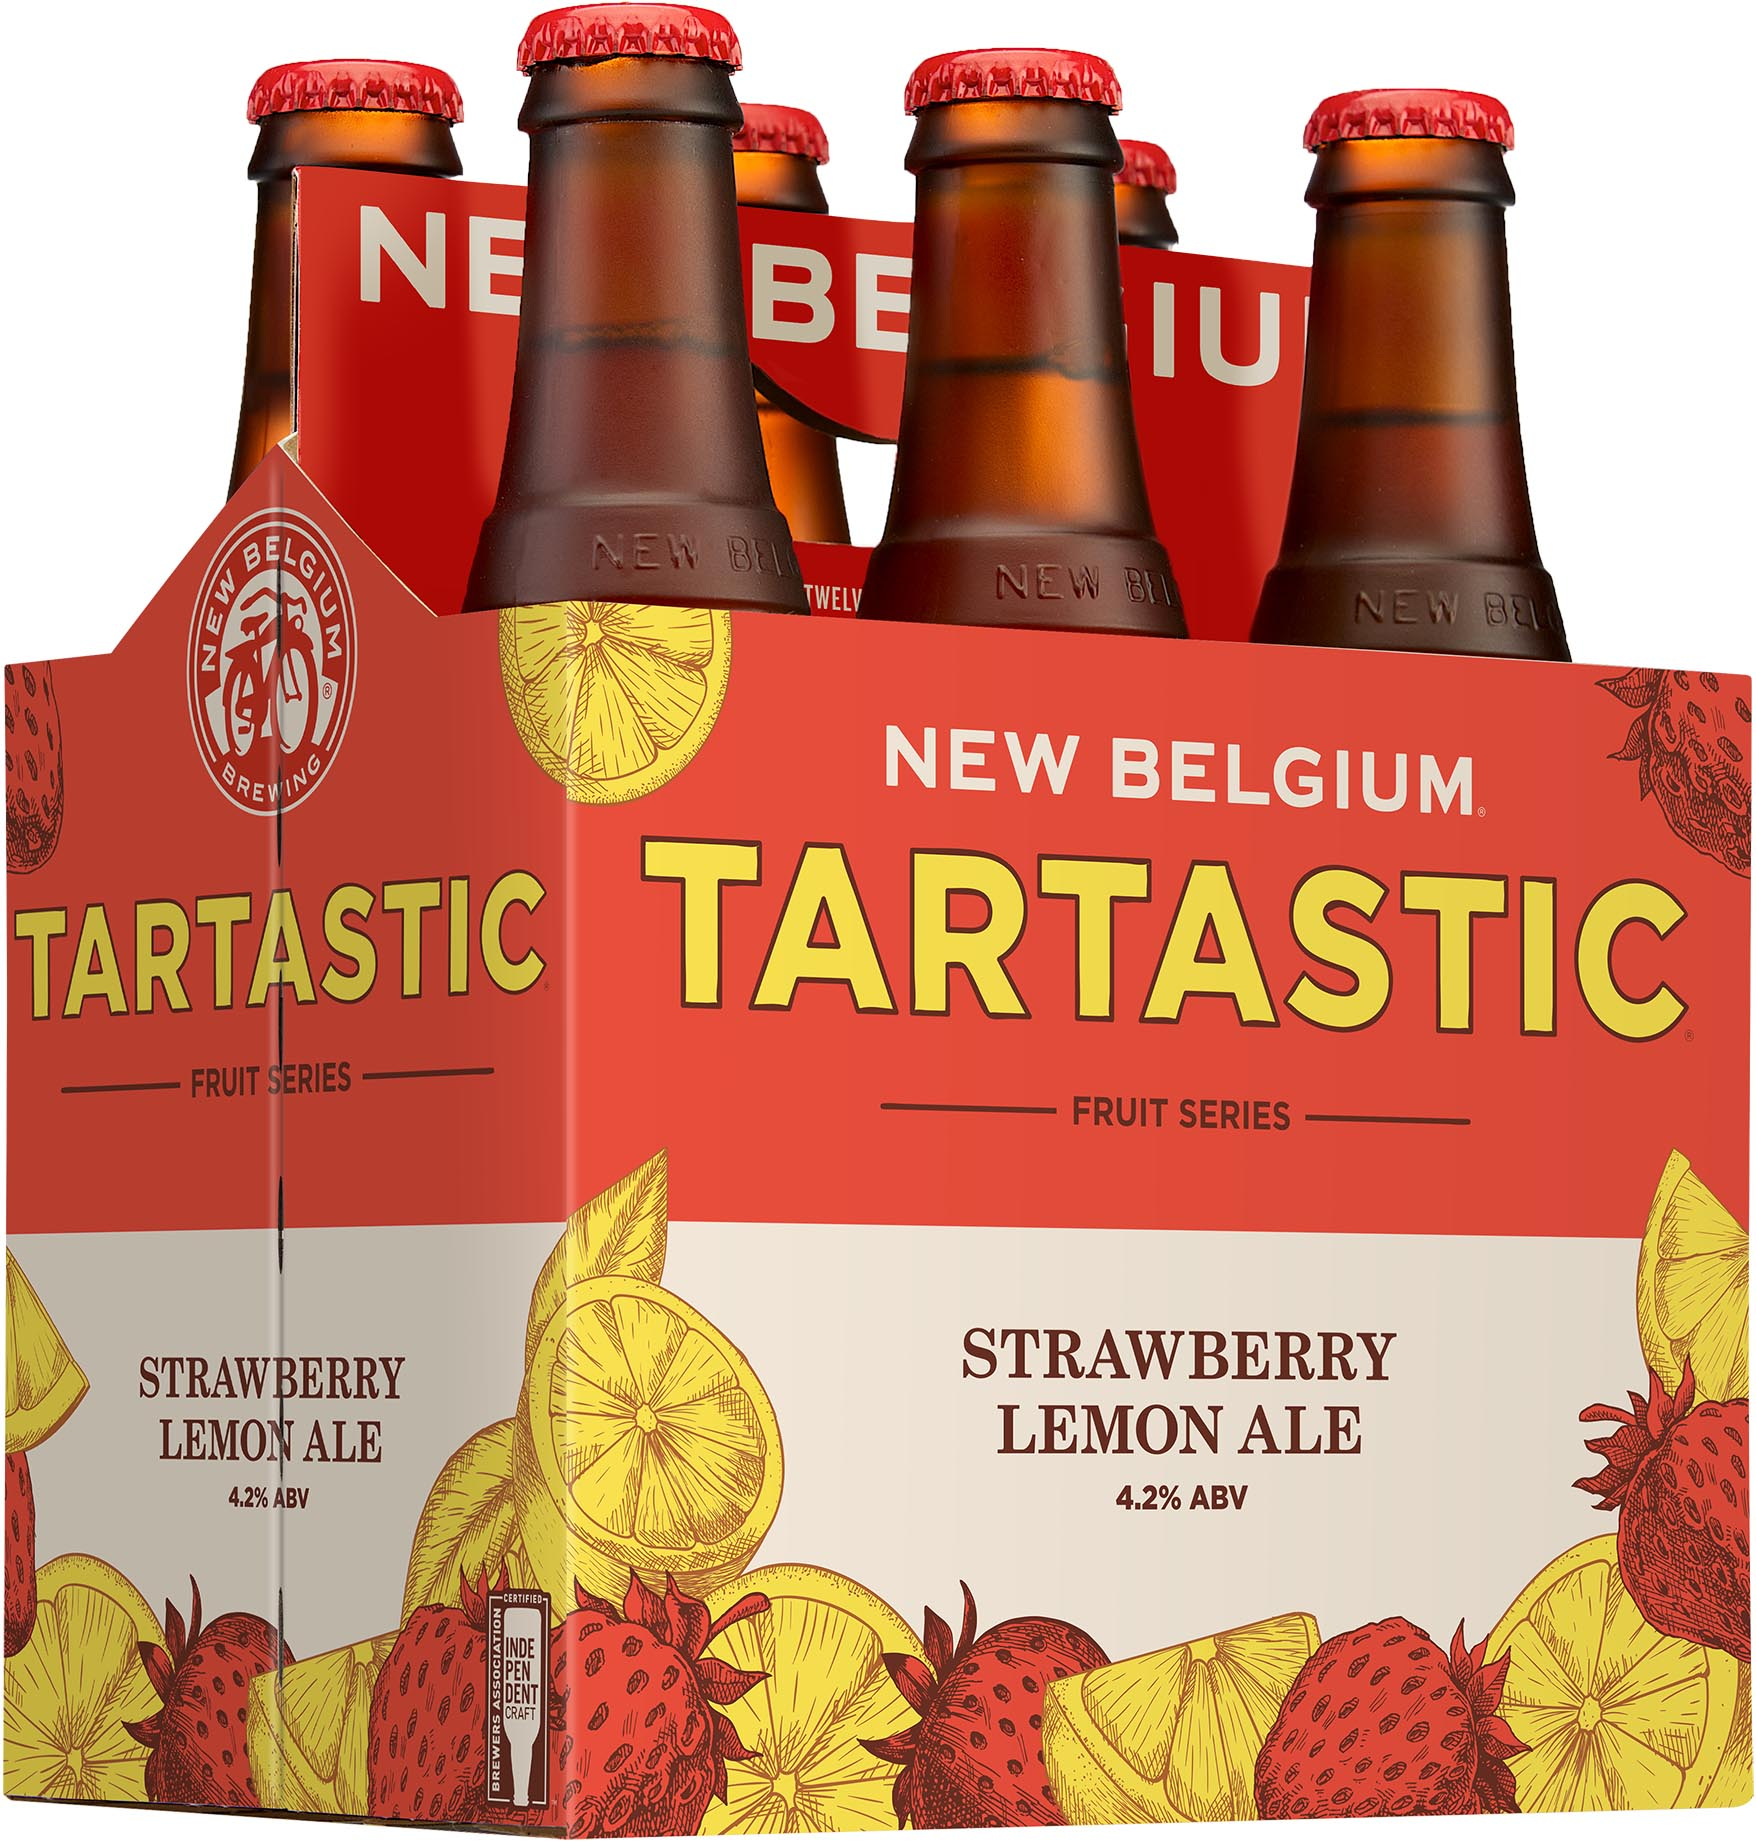 Tartastic-SL_12_oz_6_pack_bottle_side_angle.jpg